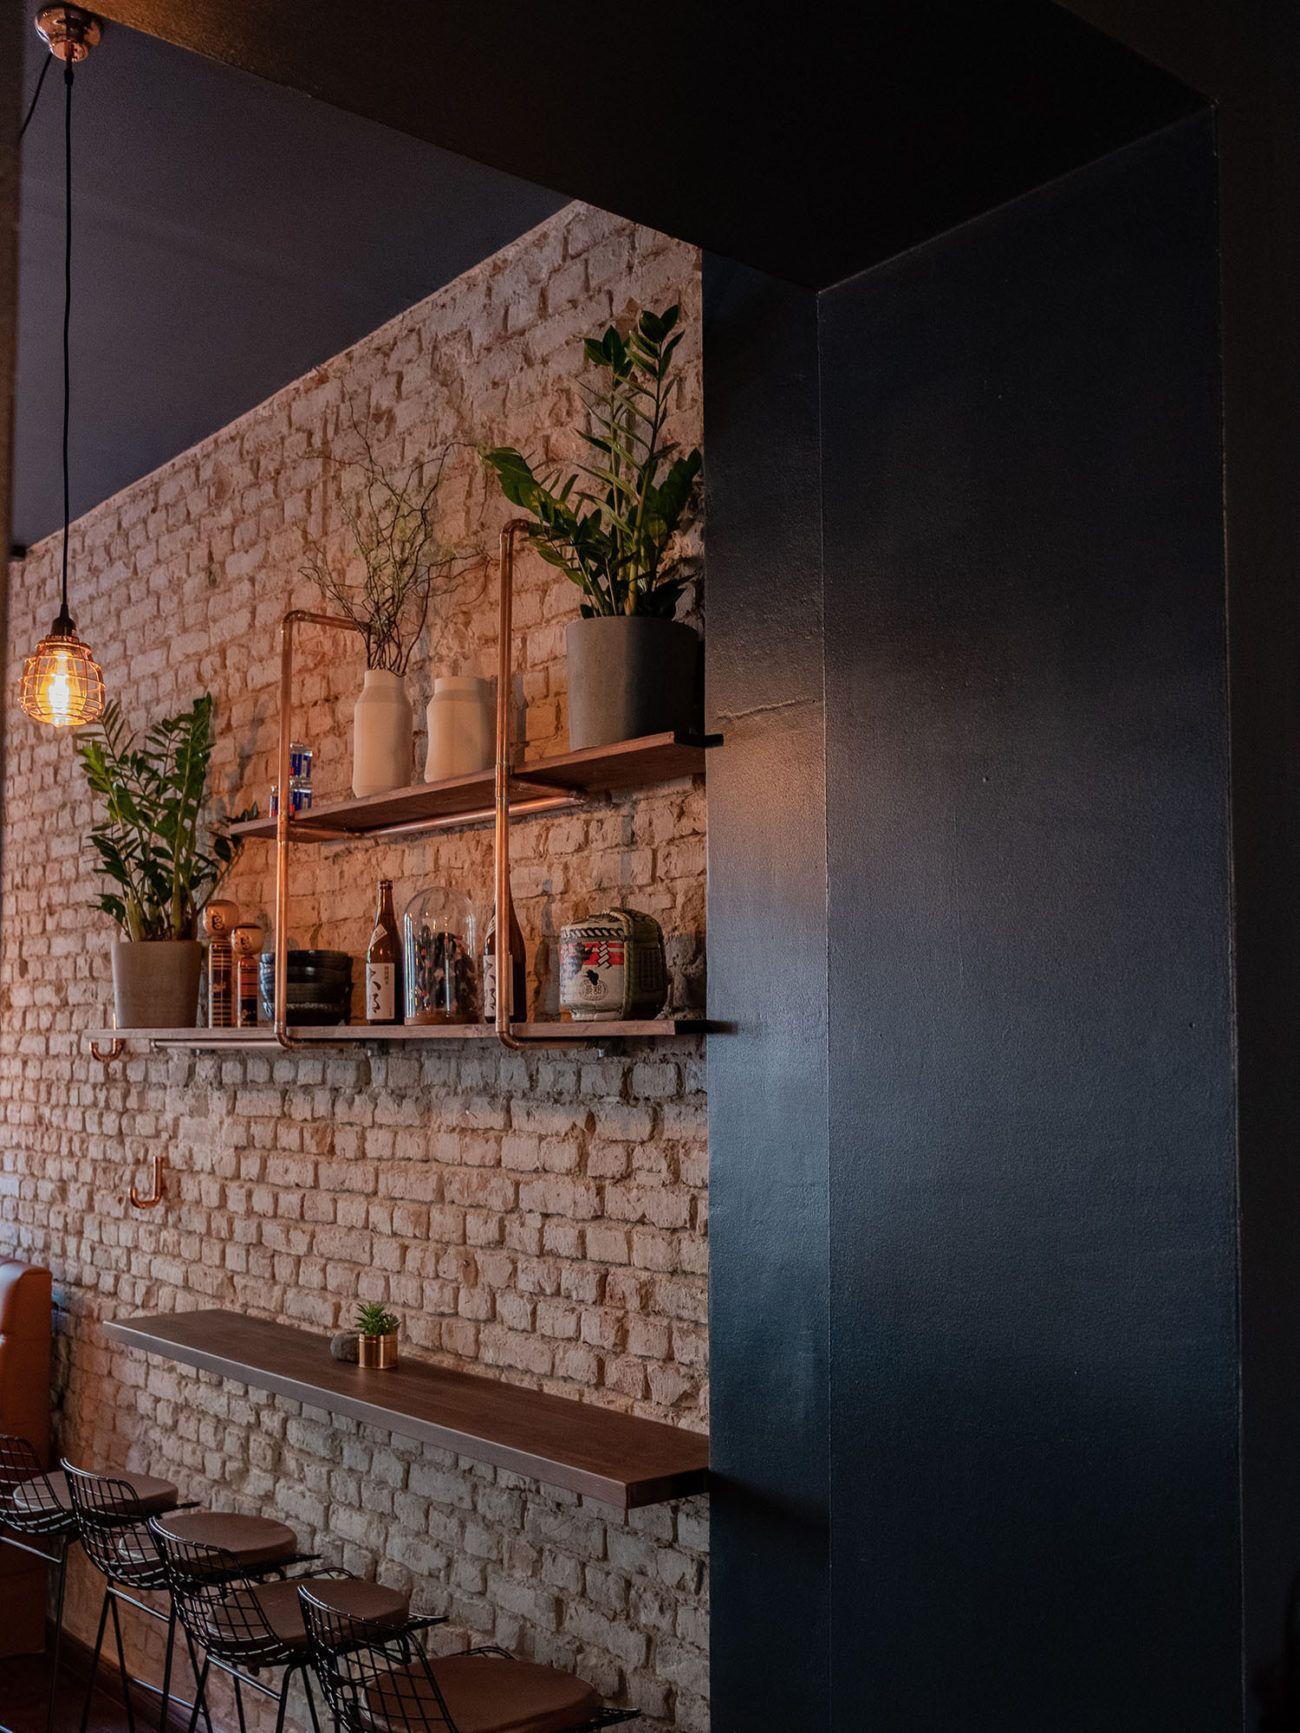 Foodblog About Fuel, Restaurant CHOTTO Berlin, Regal